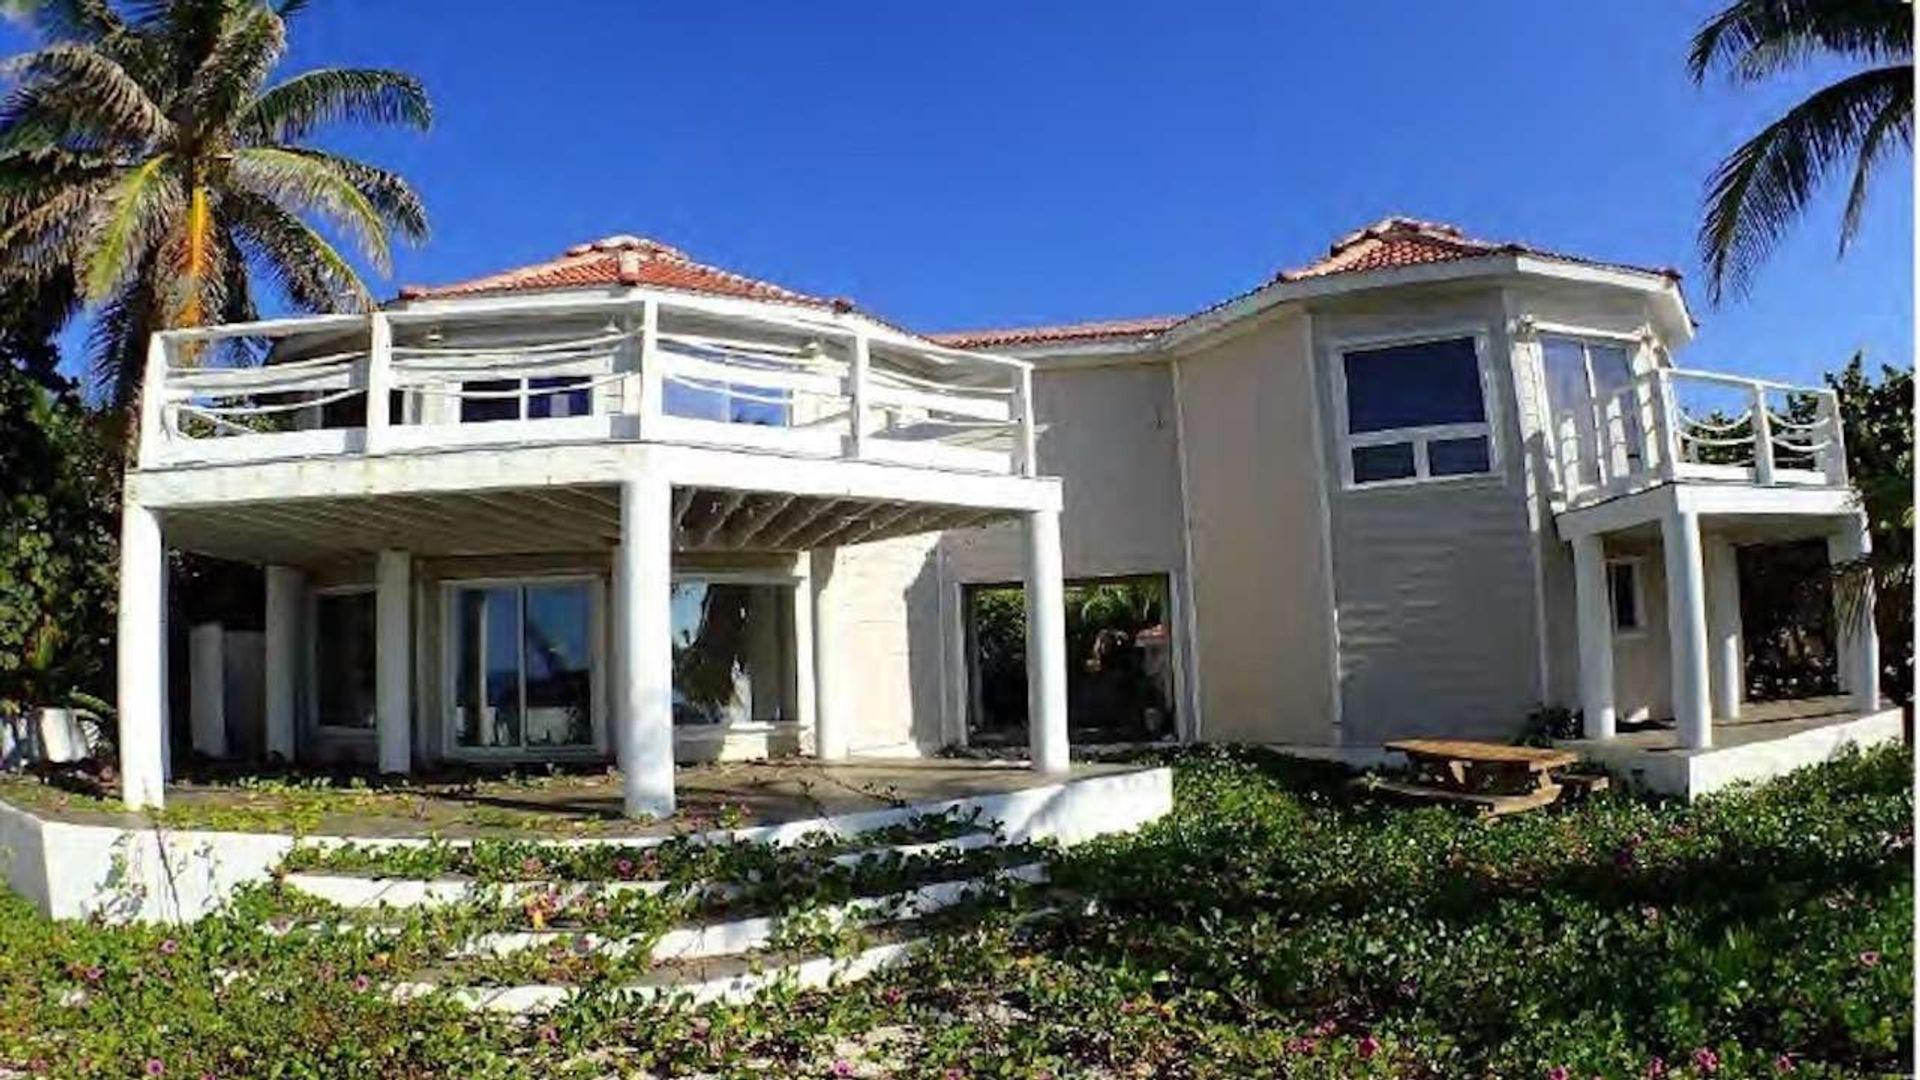 Beach Front Home, Cayman Brac